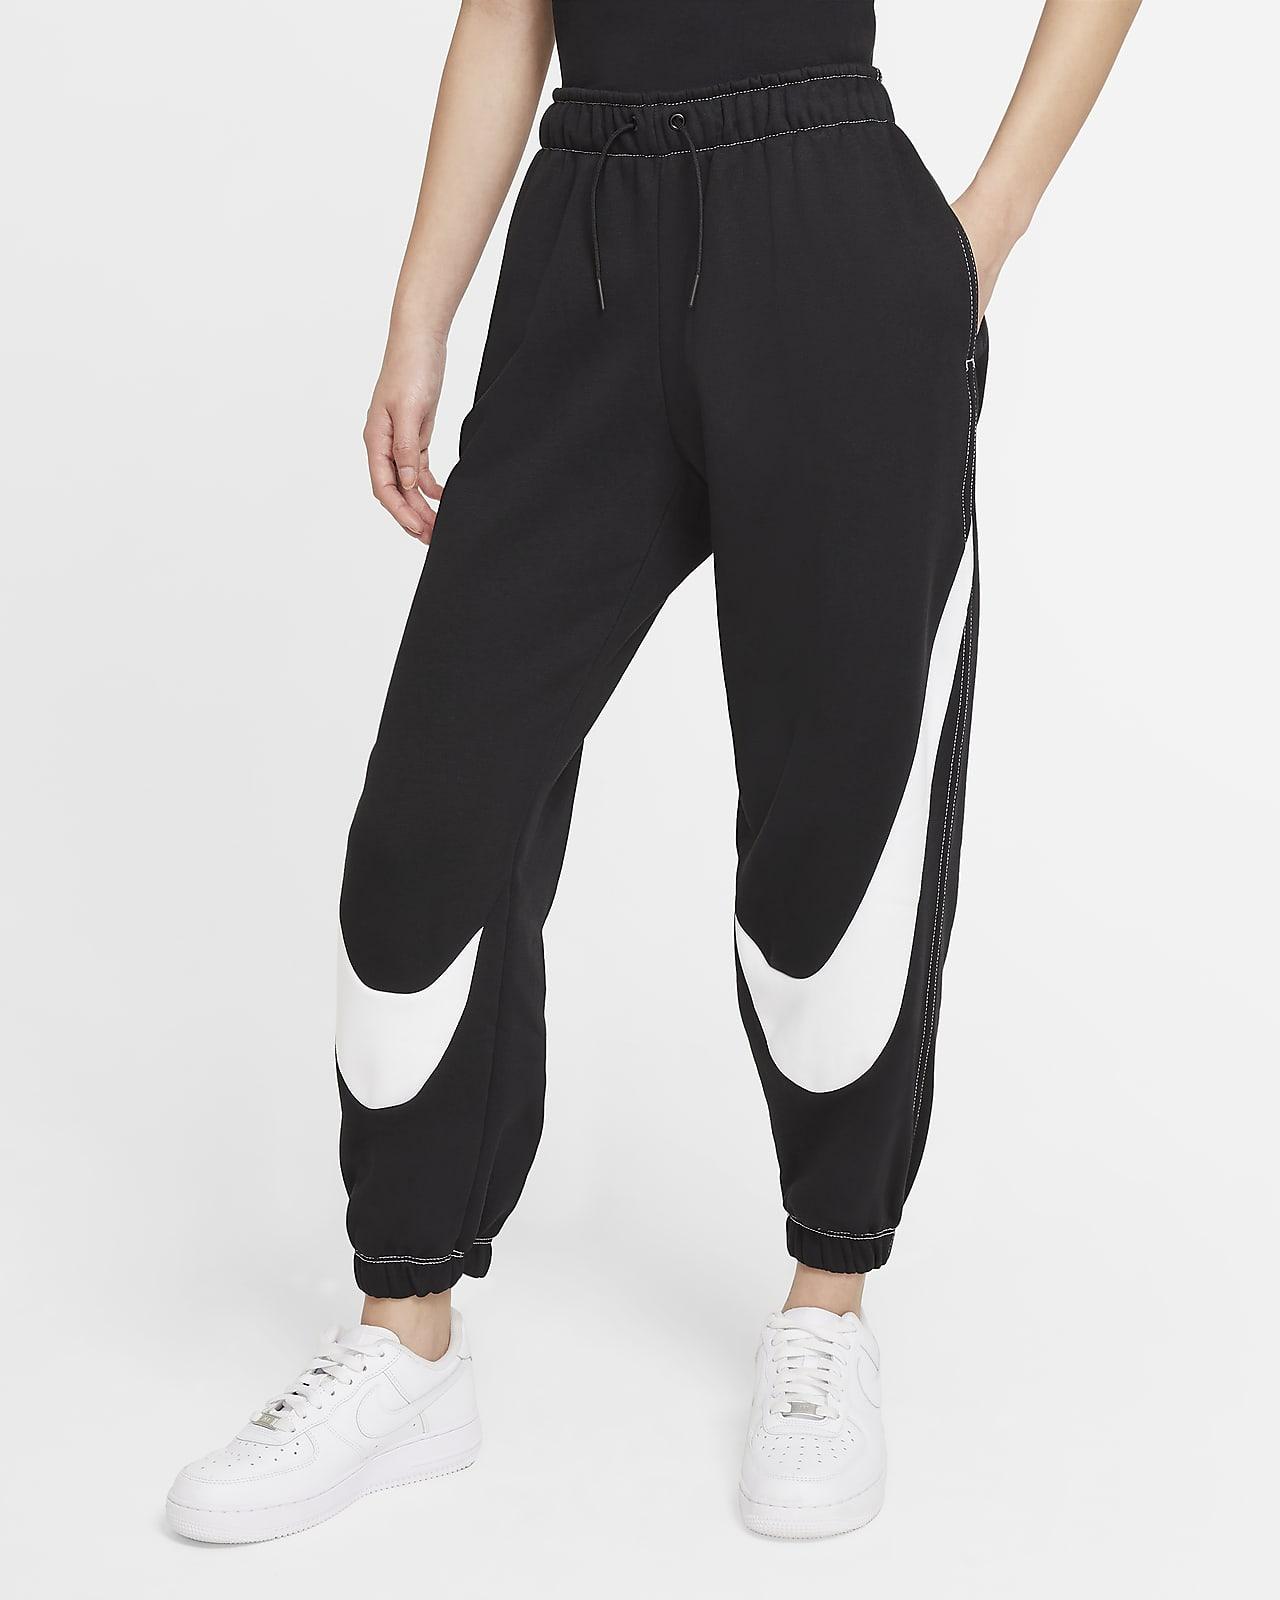 Nike Sportswear Swoosh 女款慢跑長褲